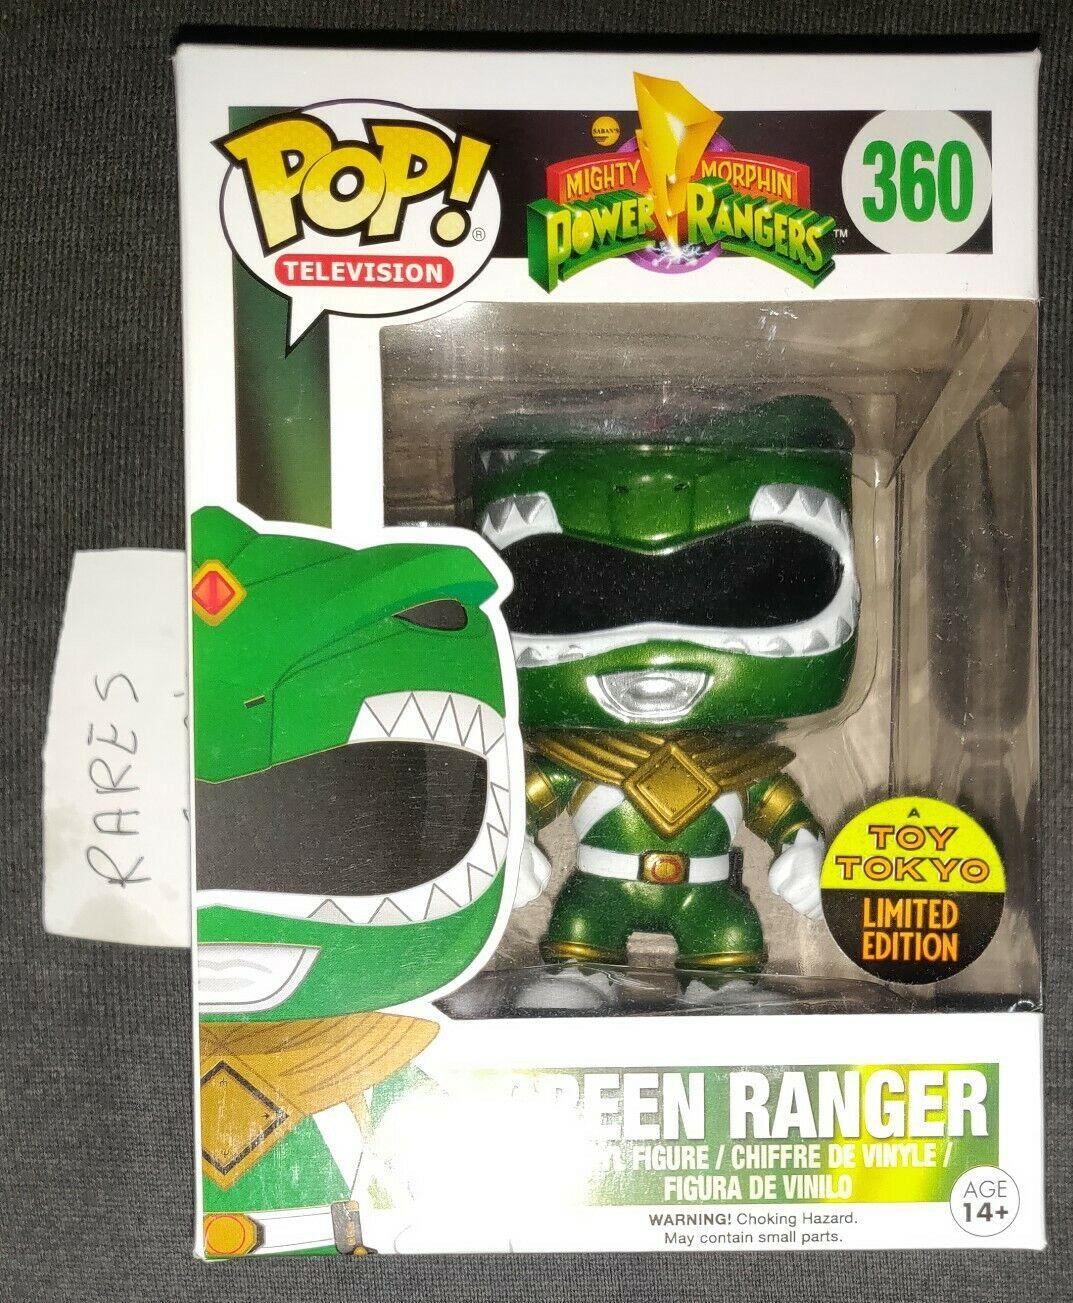 Funko Pop  verde Ranger Toy Tokyo NYCC Exclusive Power Rangers 360 2016